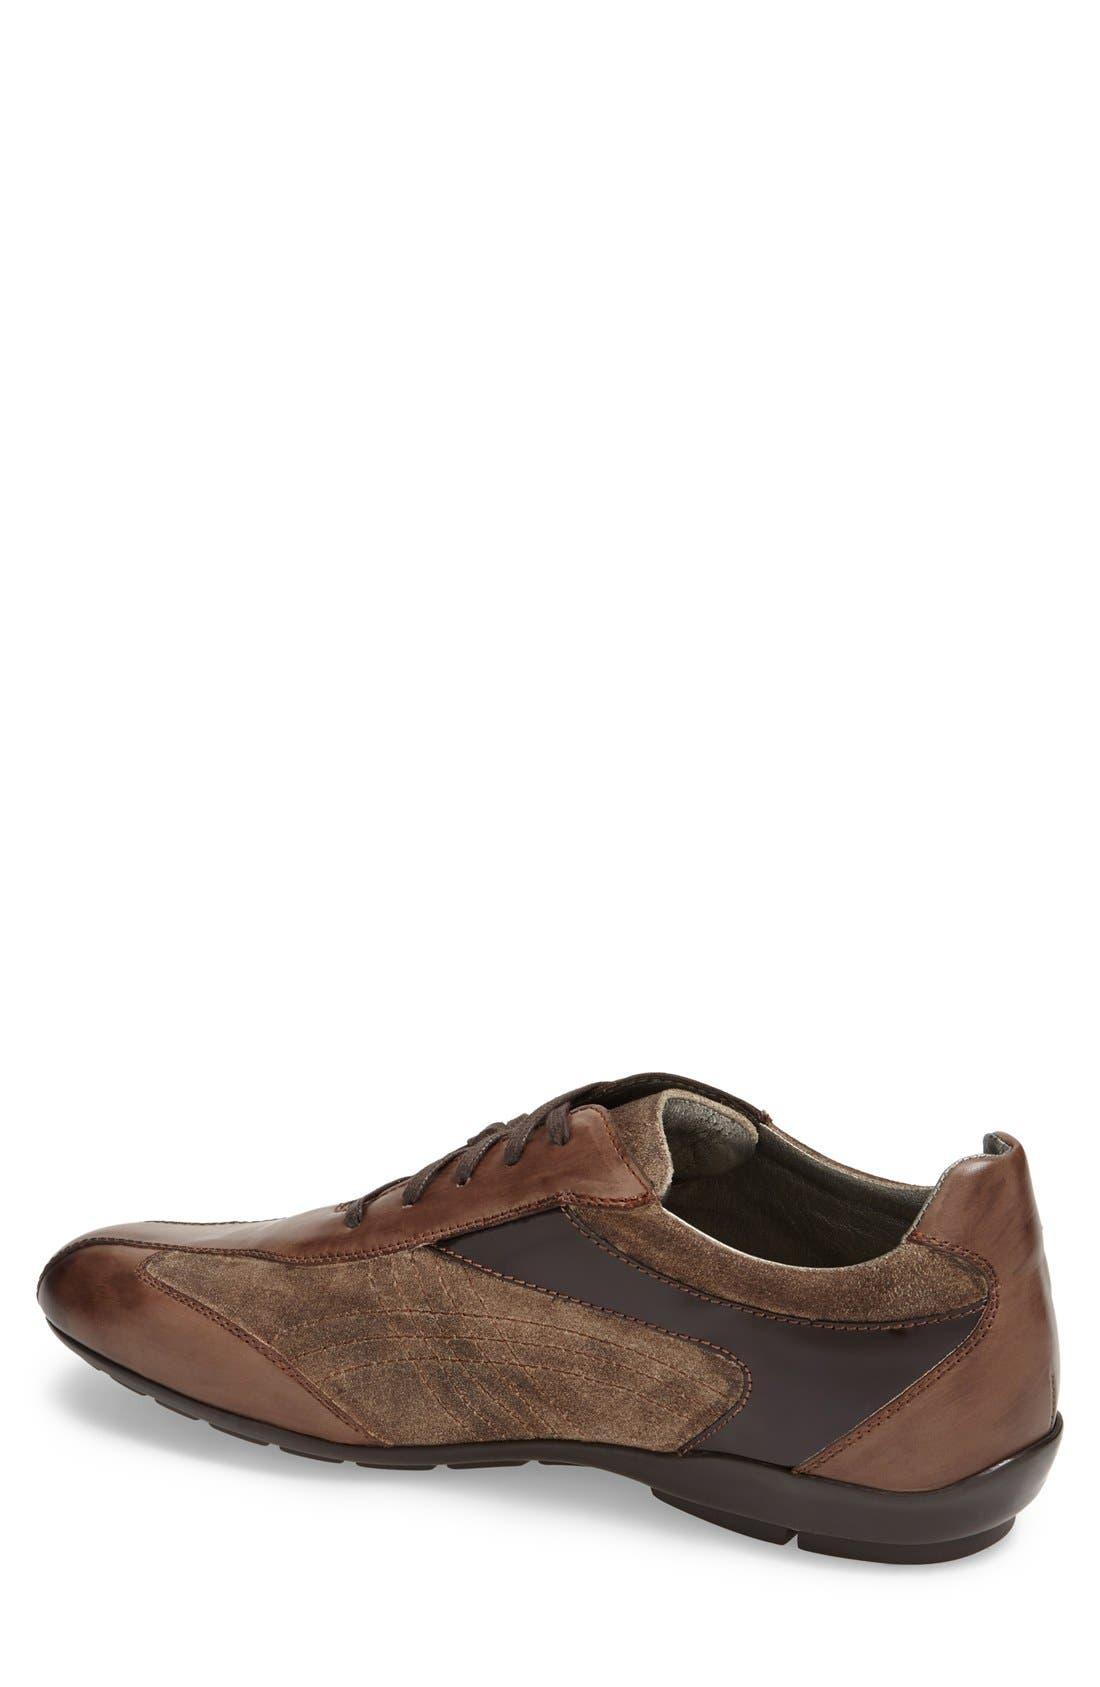 'Vega' Sneaker,                             Alternate thumbnail 3, color,                             MOCHA/ TAUPE